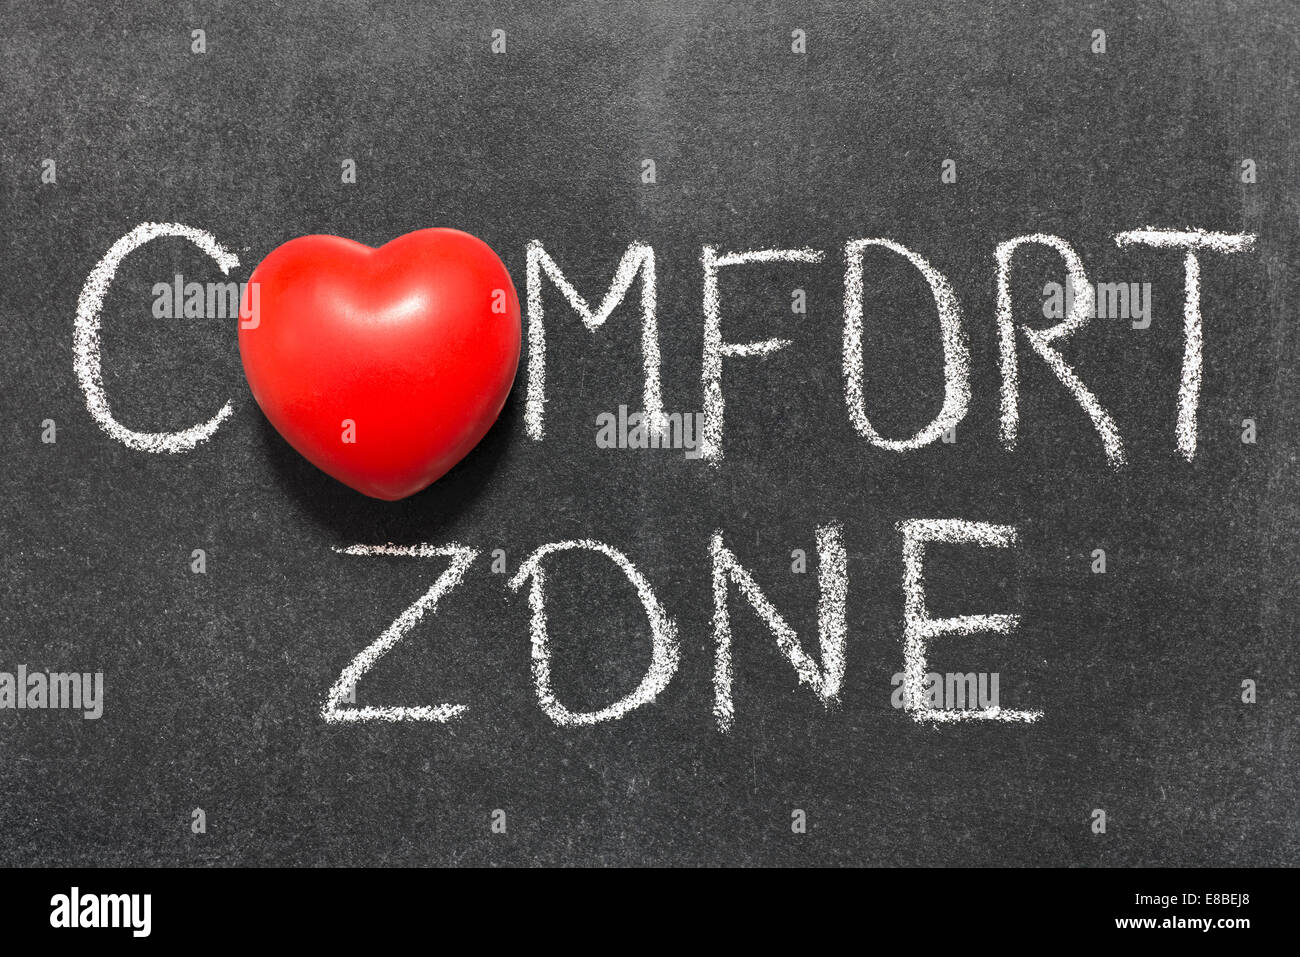 comfort zone phrase handwritten on blackboard with heart symbol instead of O Stock Photo